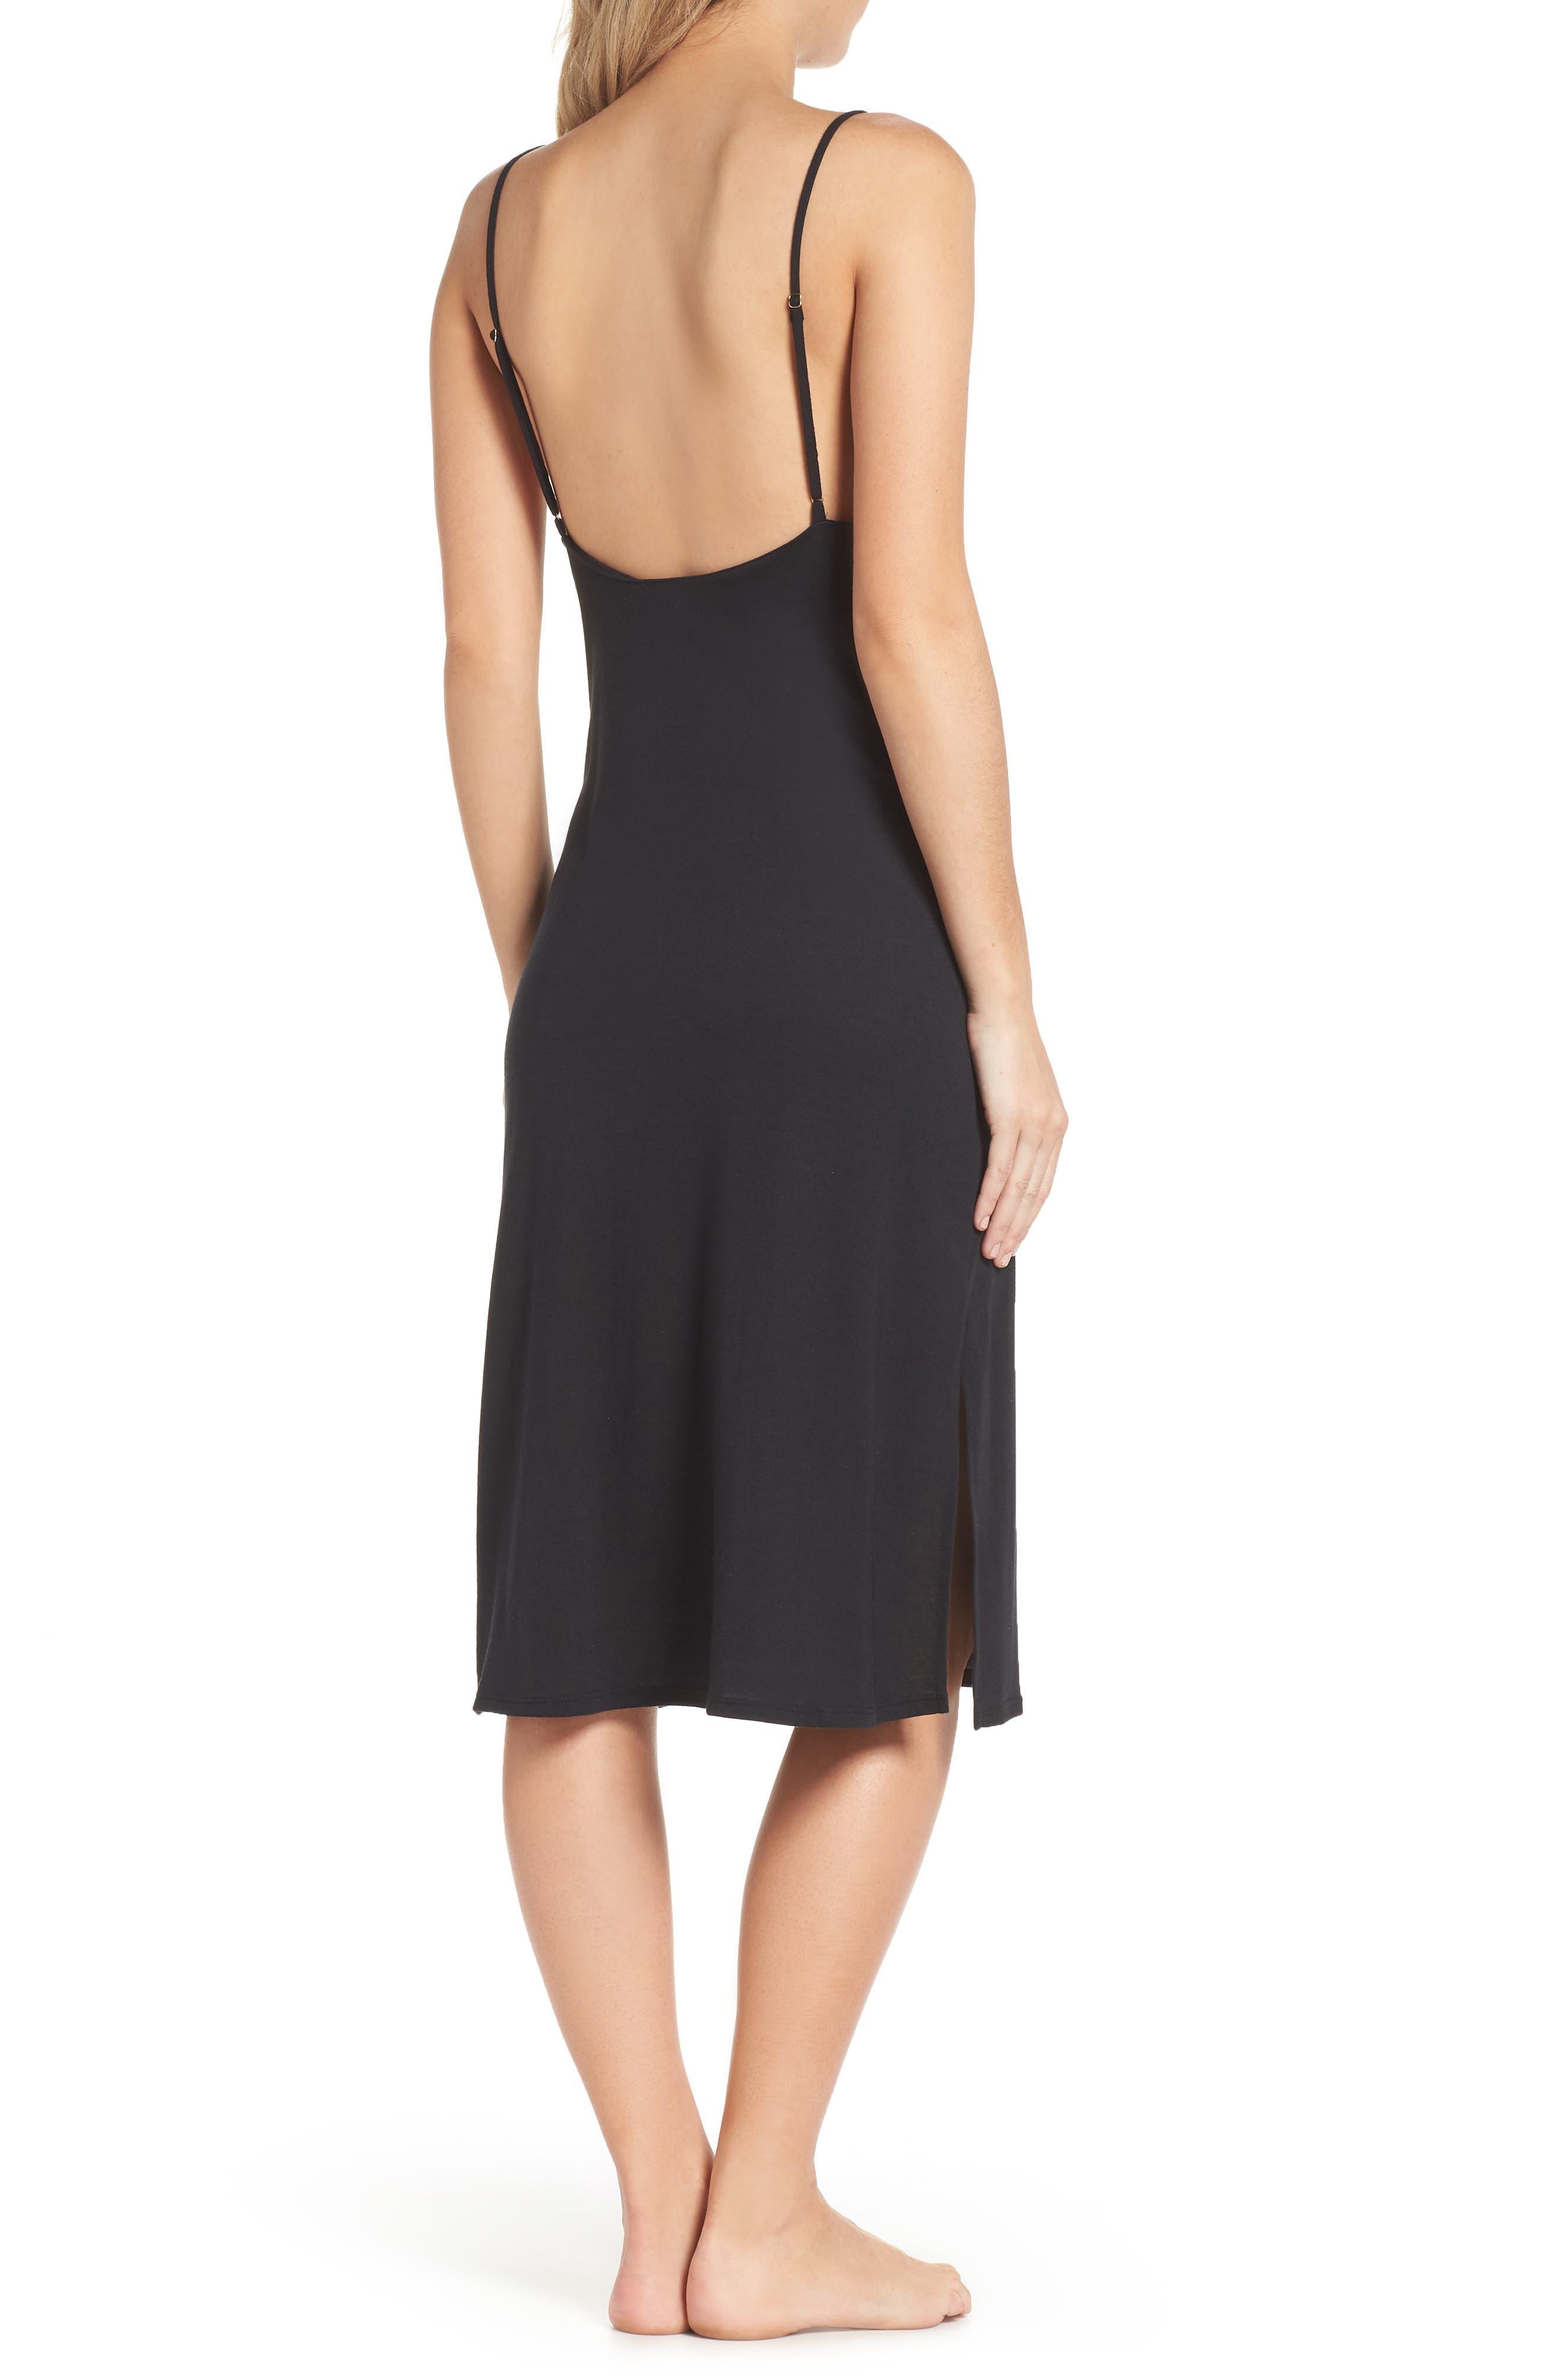 NATORI, Luxe Shangri-La Nightgown, Alternate thumbnail 2, color, BLACK